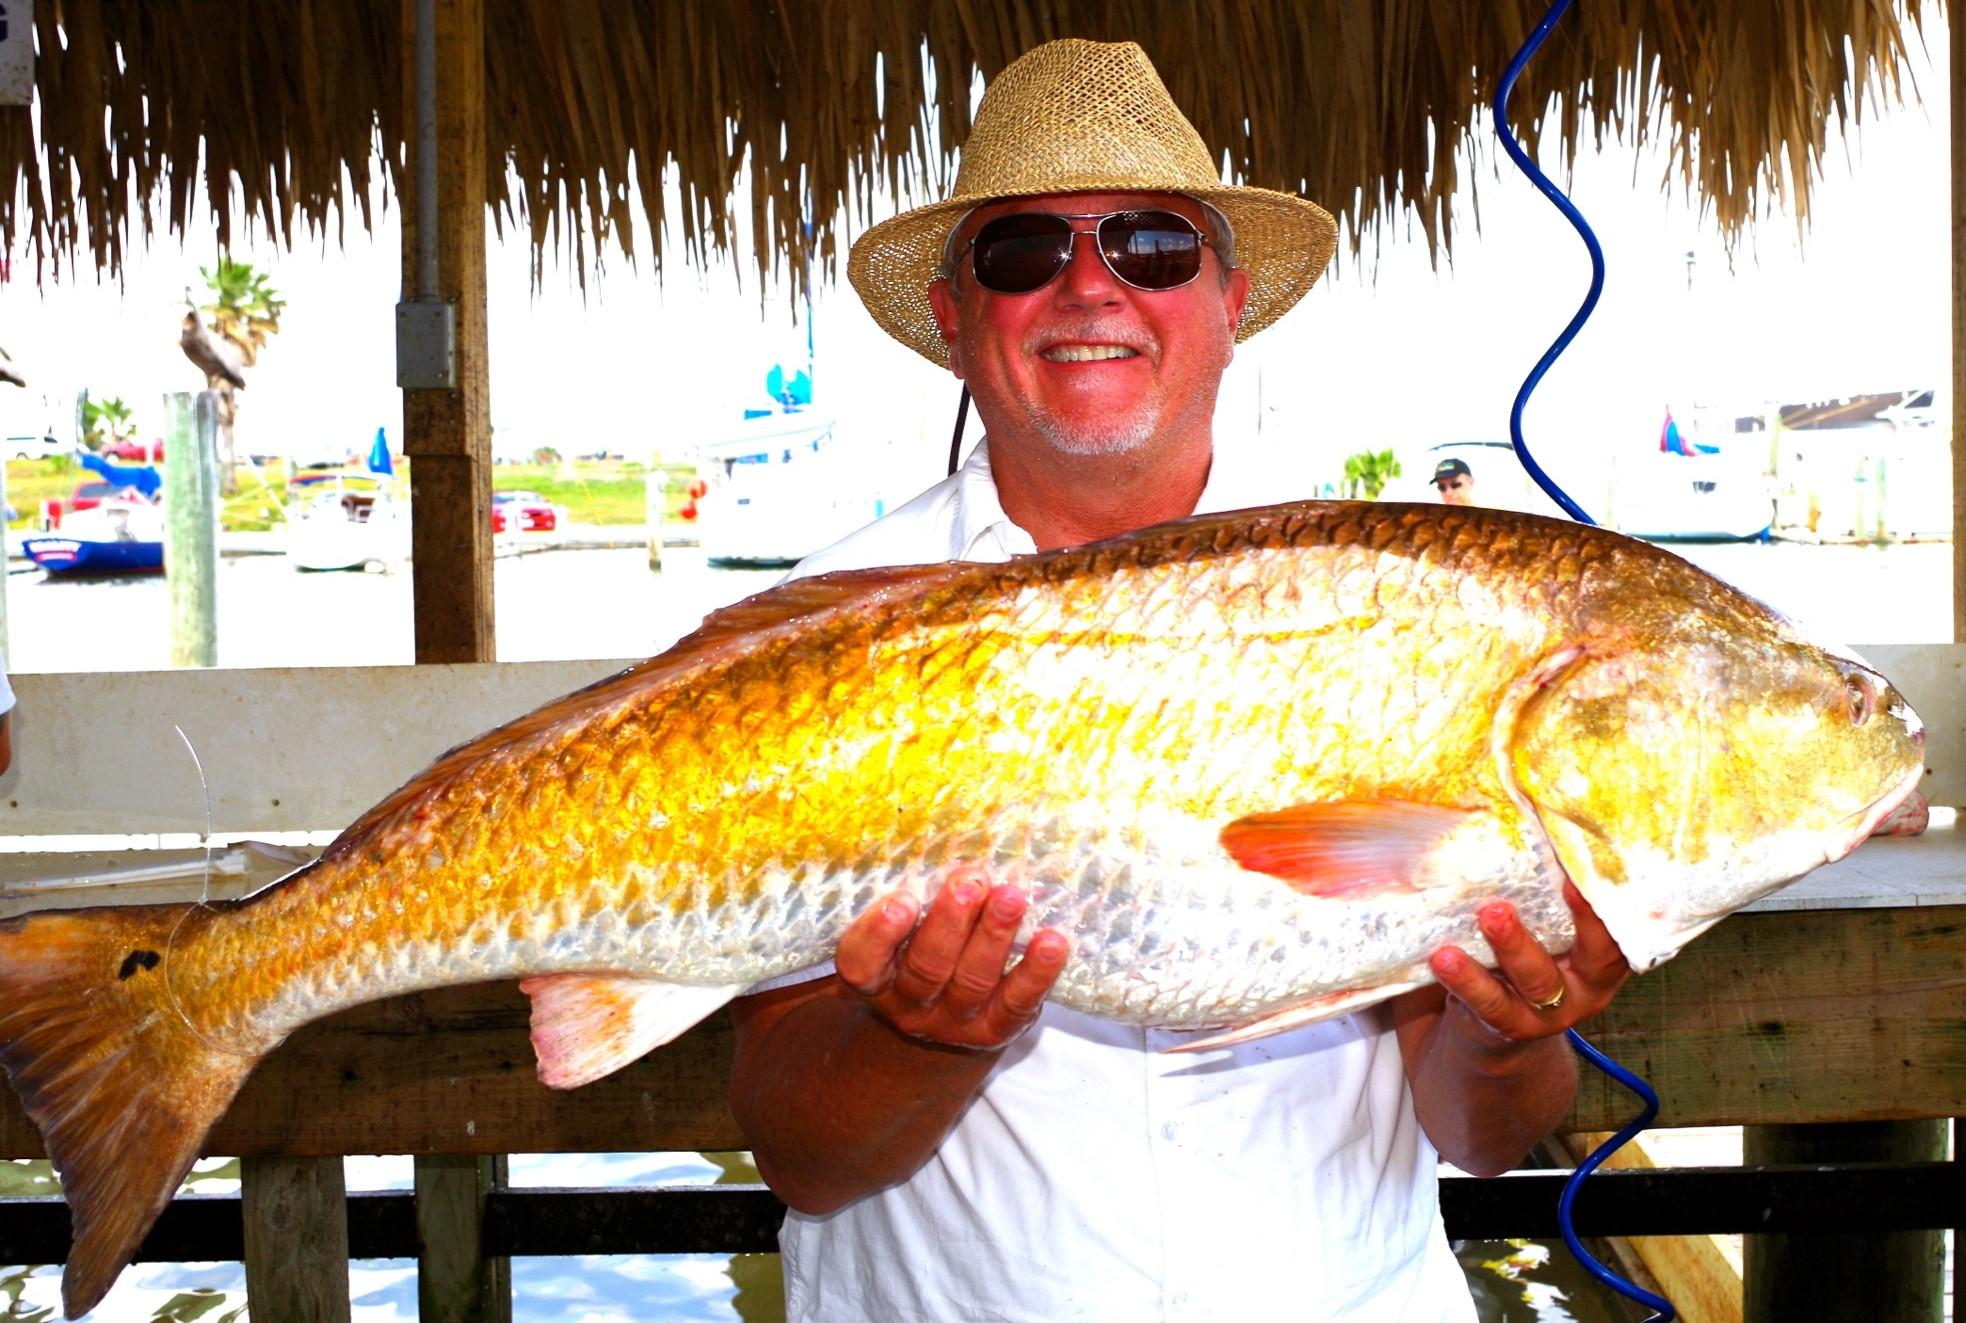 https://0201.nccdn.net/1_2/000/000/199/c20/galveston-fishing-redfish--2-.jpg